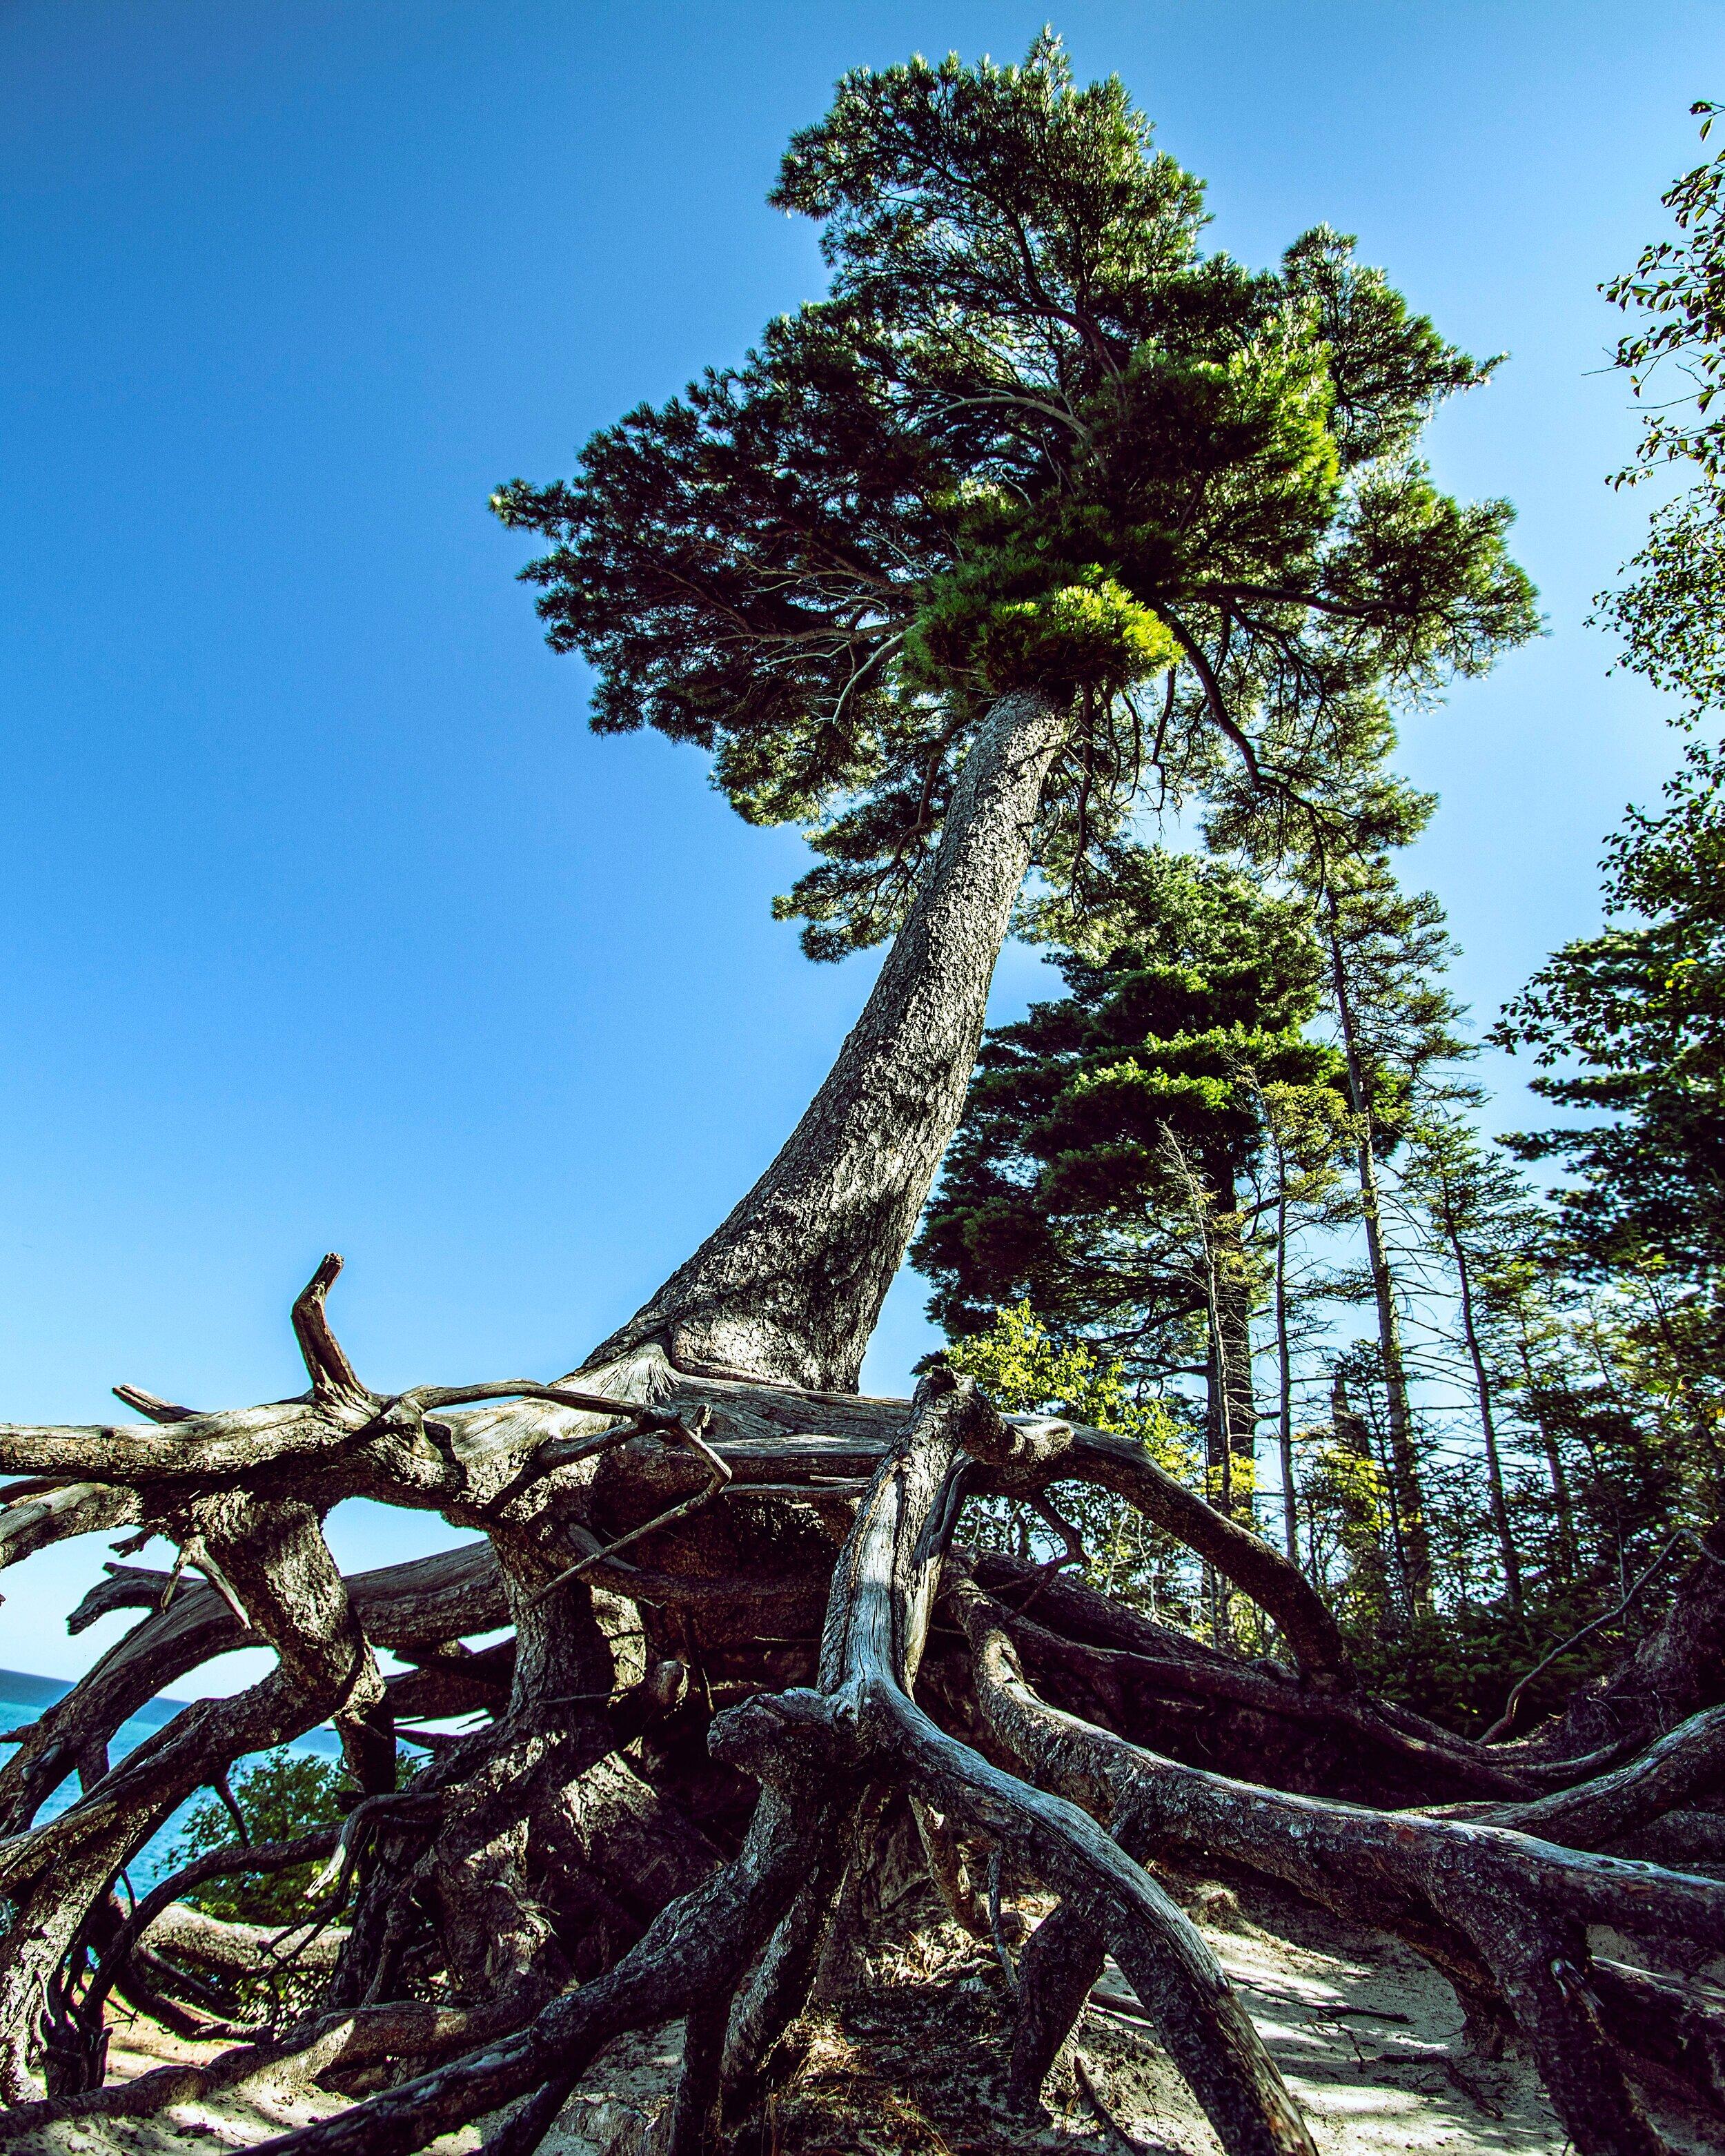 Spider Roots Tree, Michigan, 08.19.2019